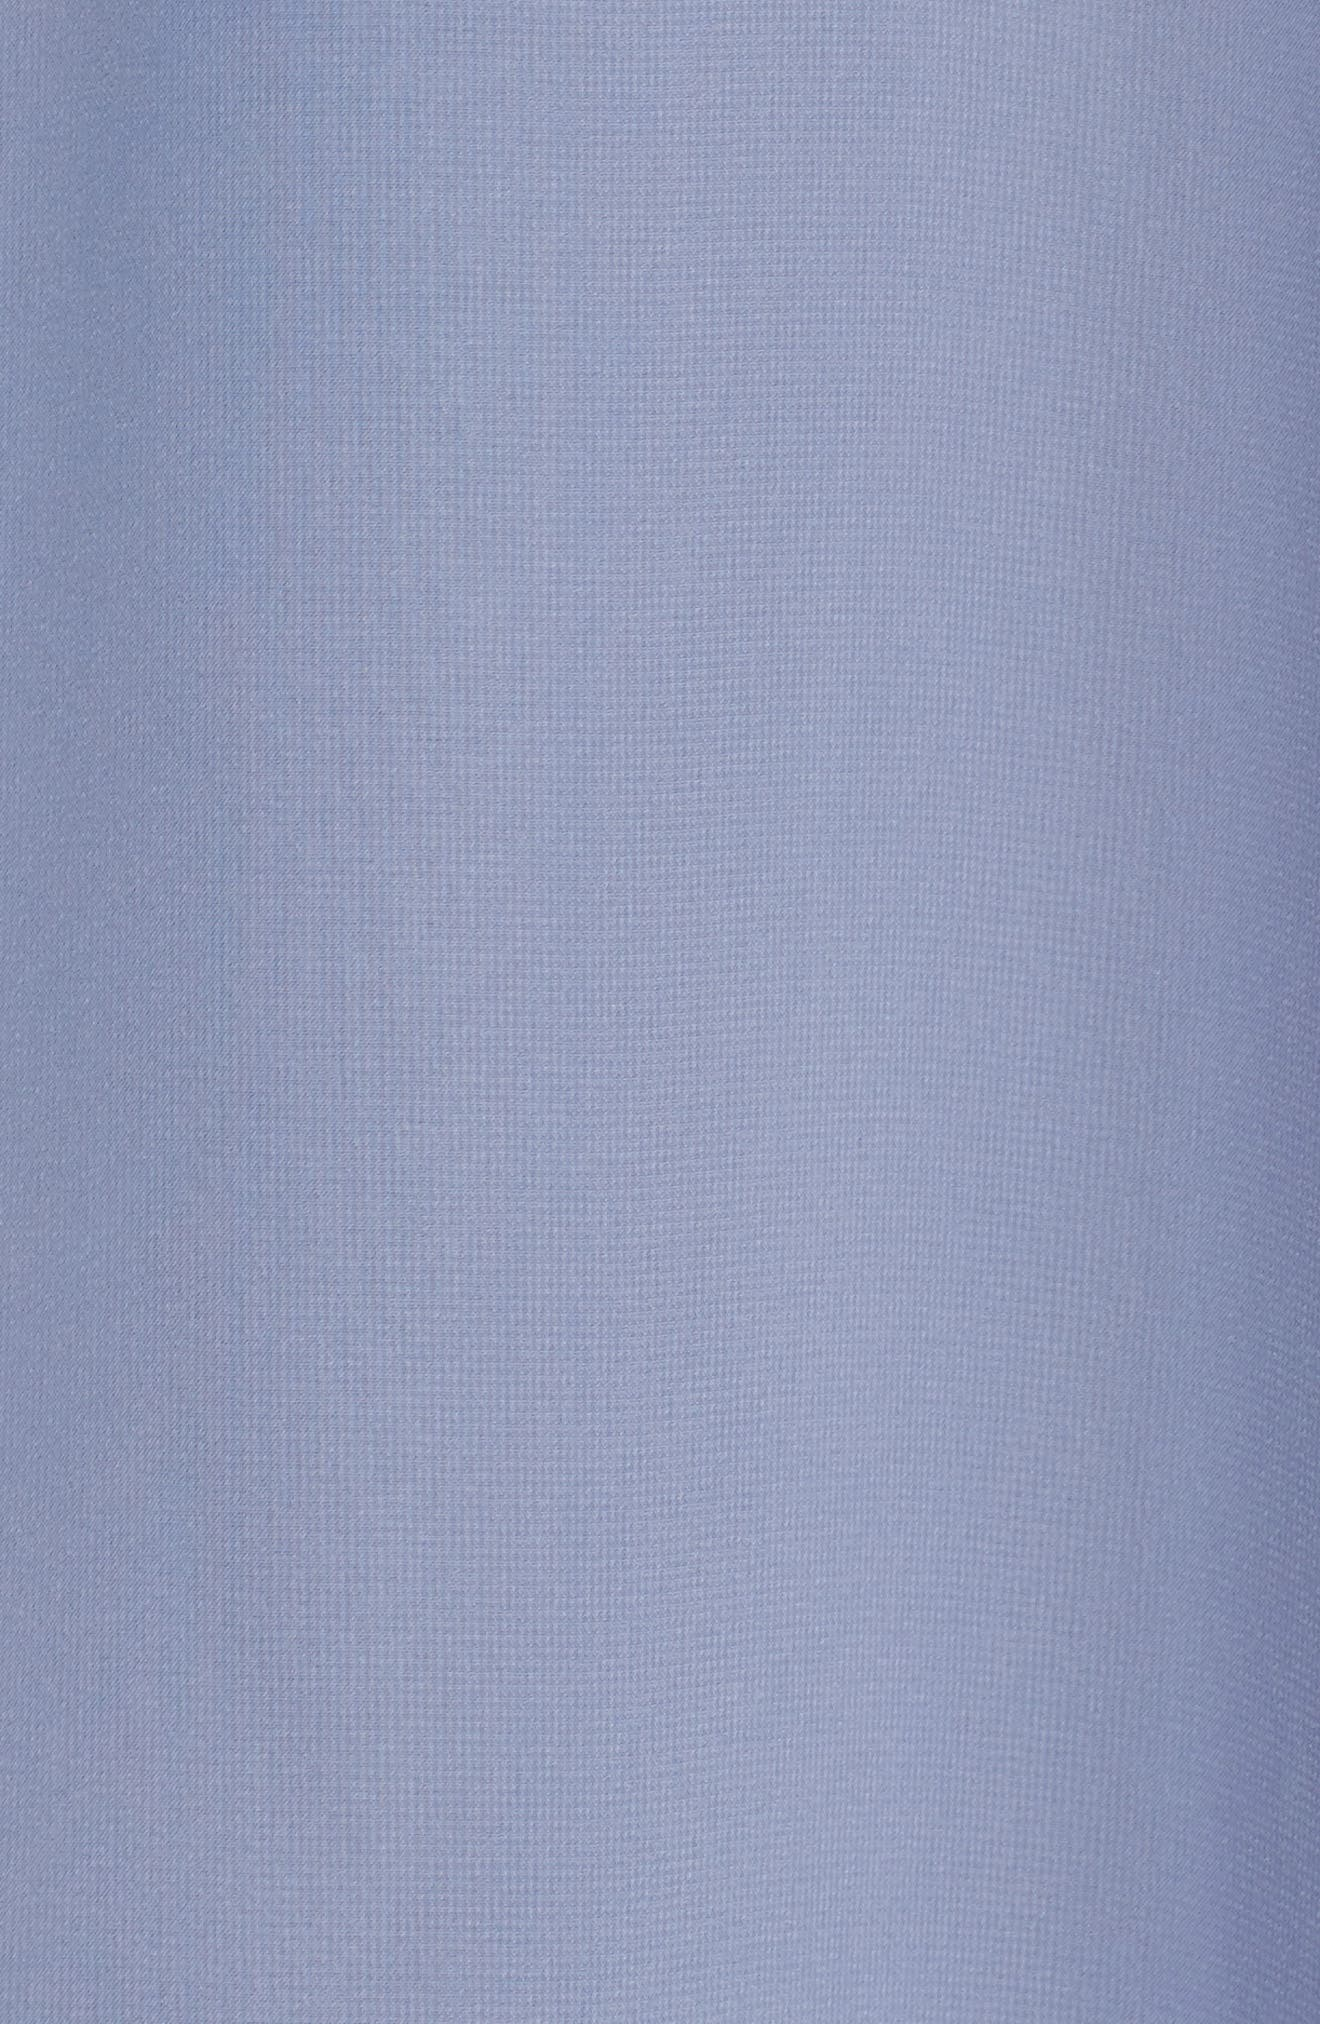 One-Shoulder Chiffon A-Line Gown,                             Alternate thumbnail 5, color,                             020